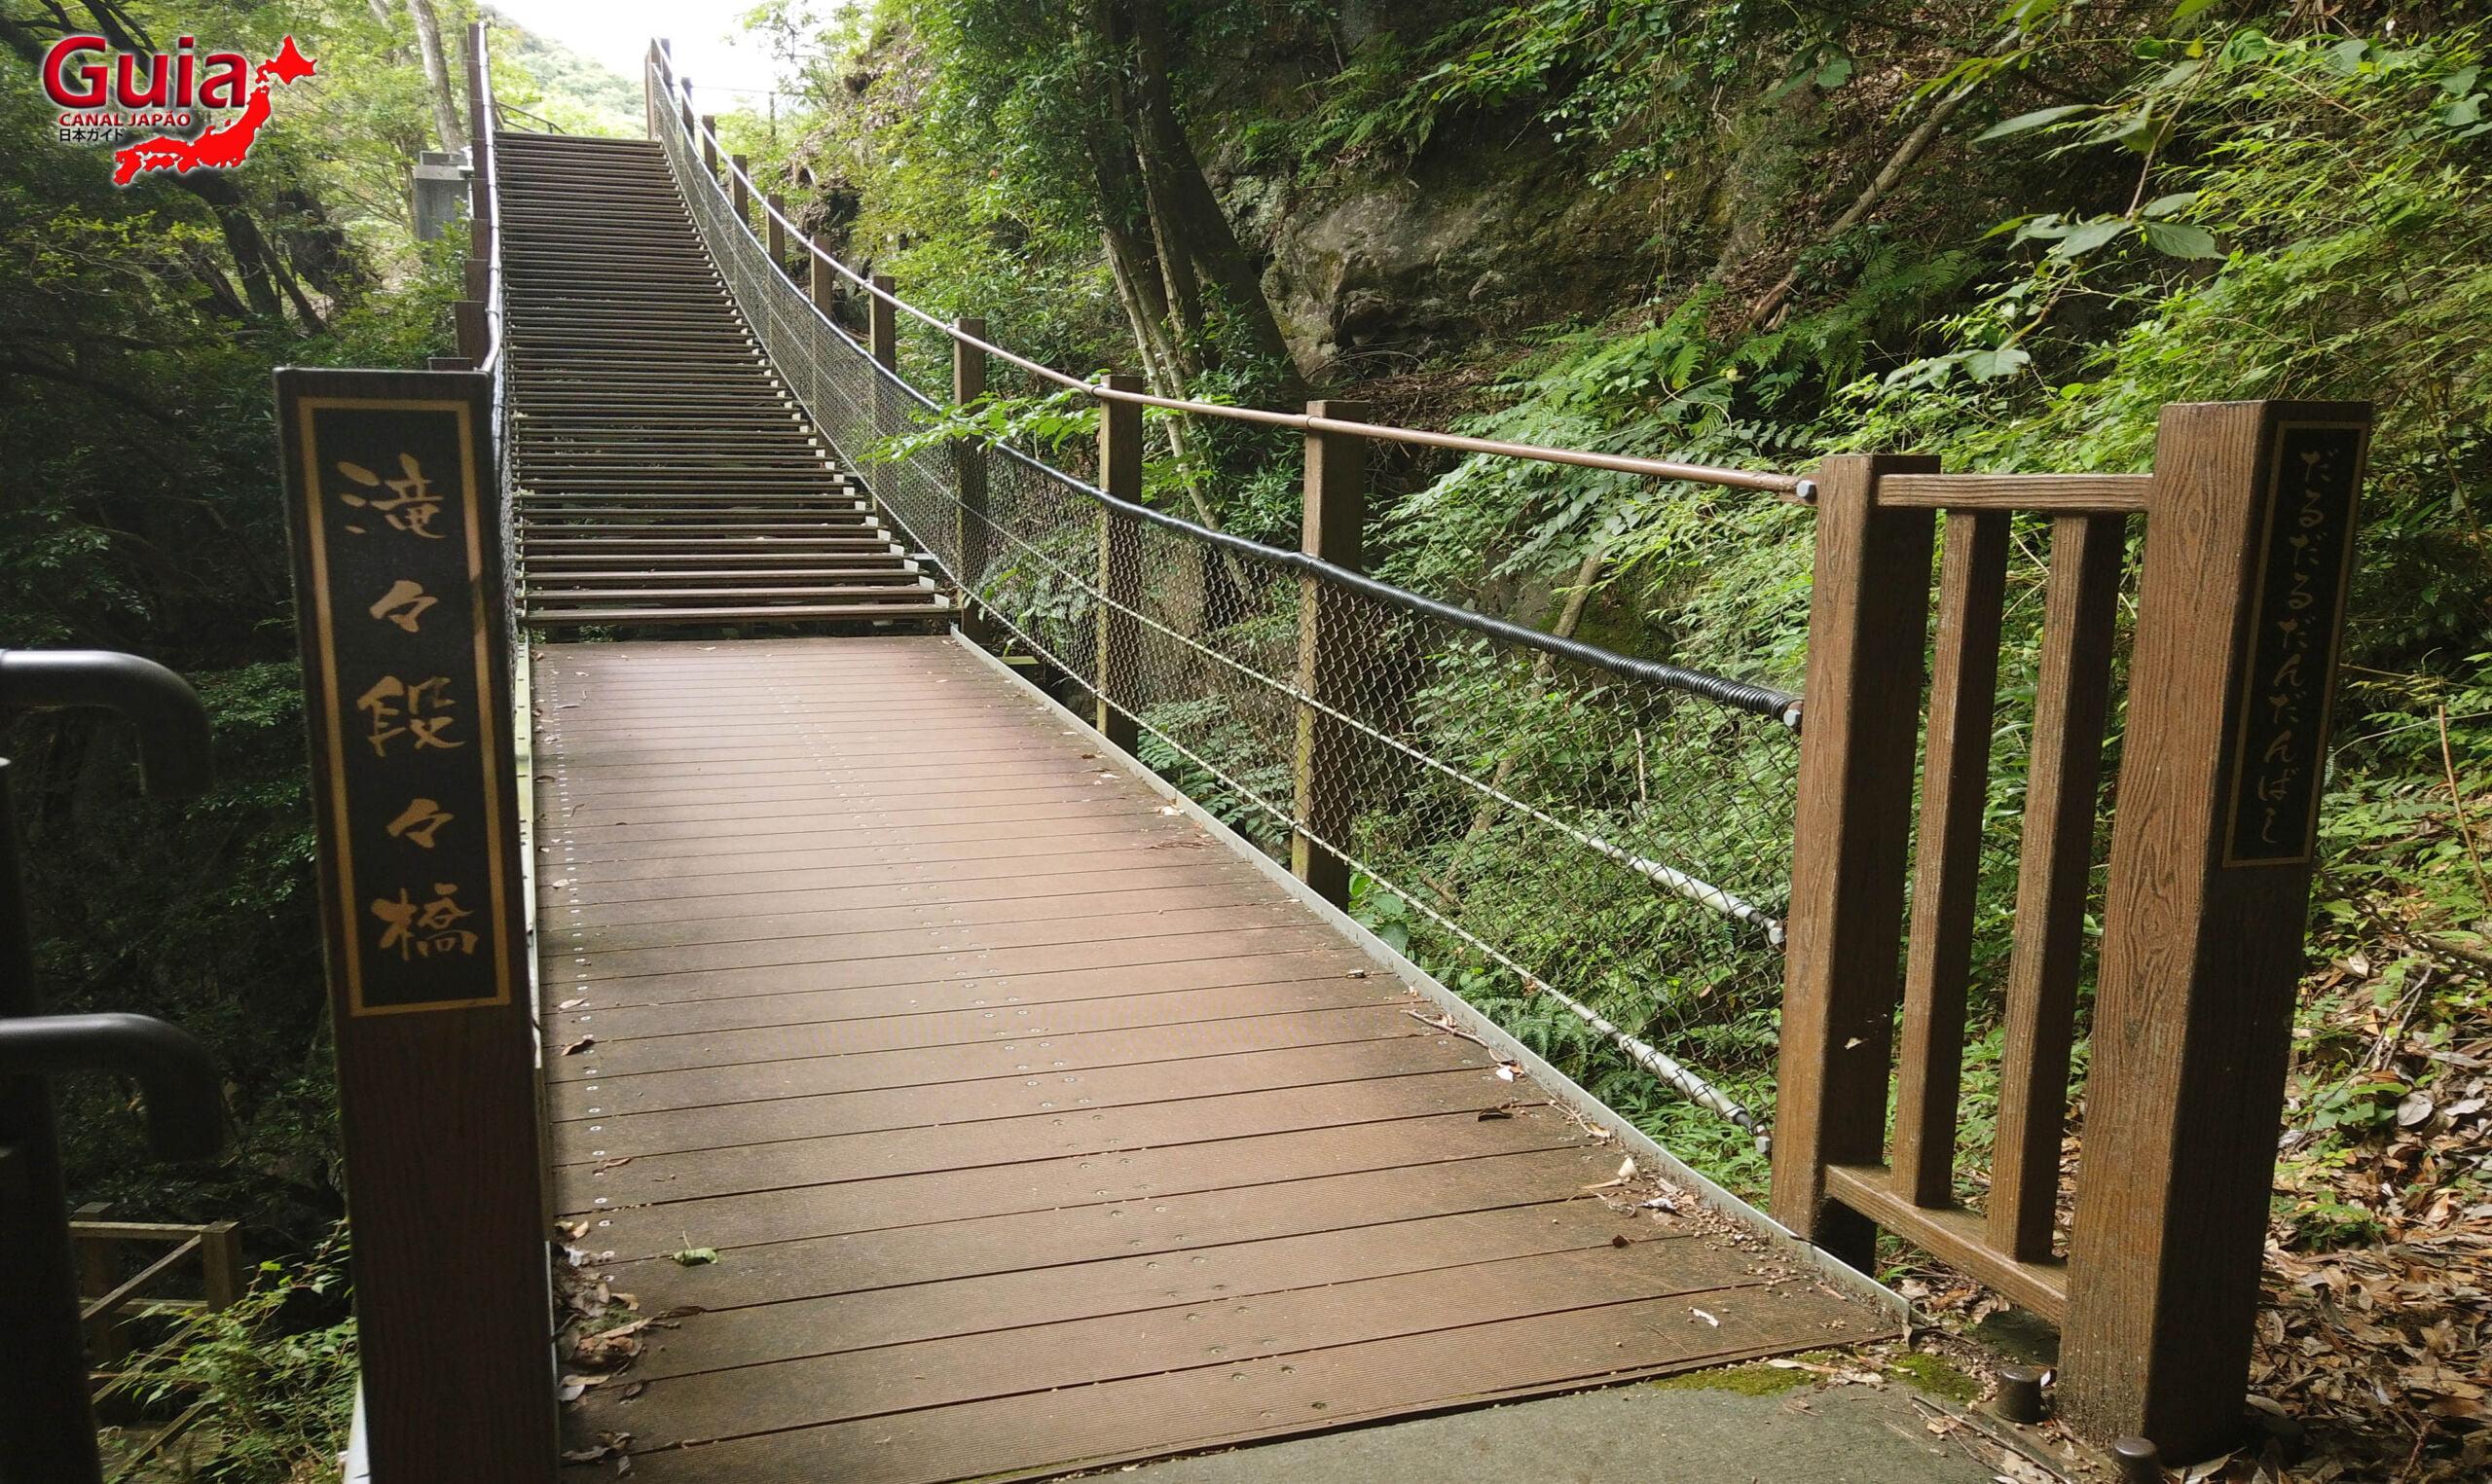 7 Cachoeira de Kawazu Nanadaru - 河津 七 滝 8